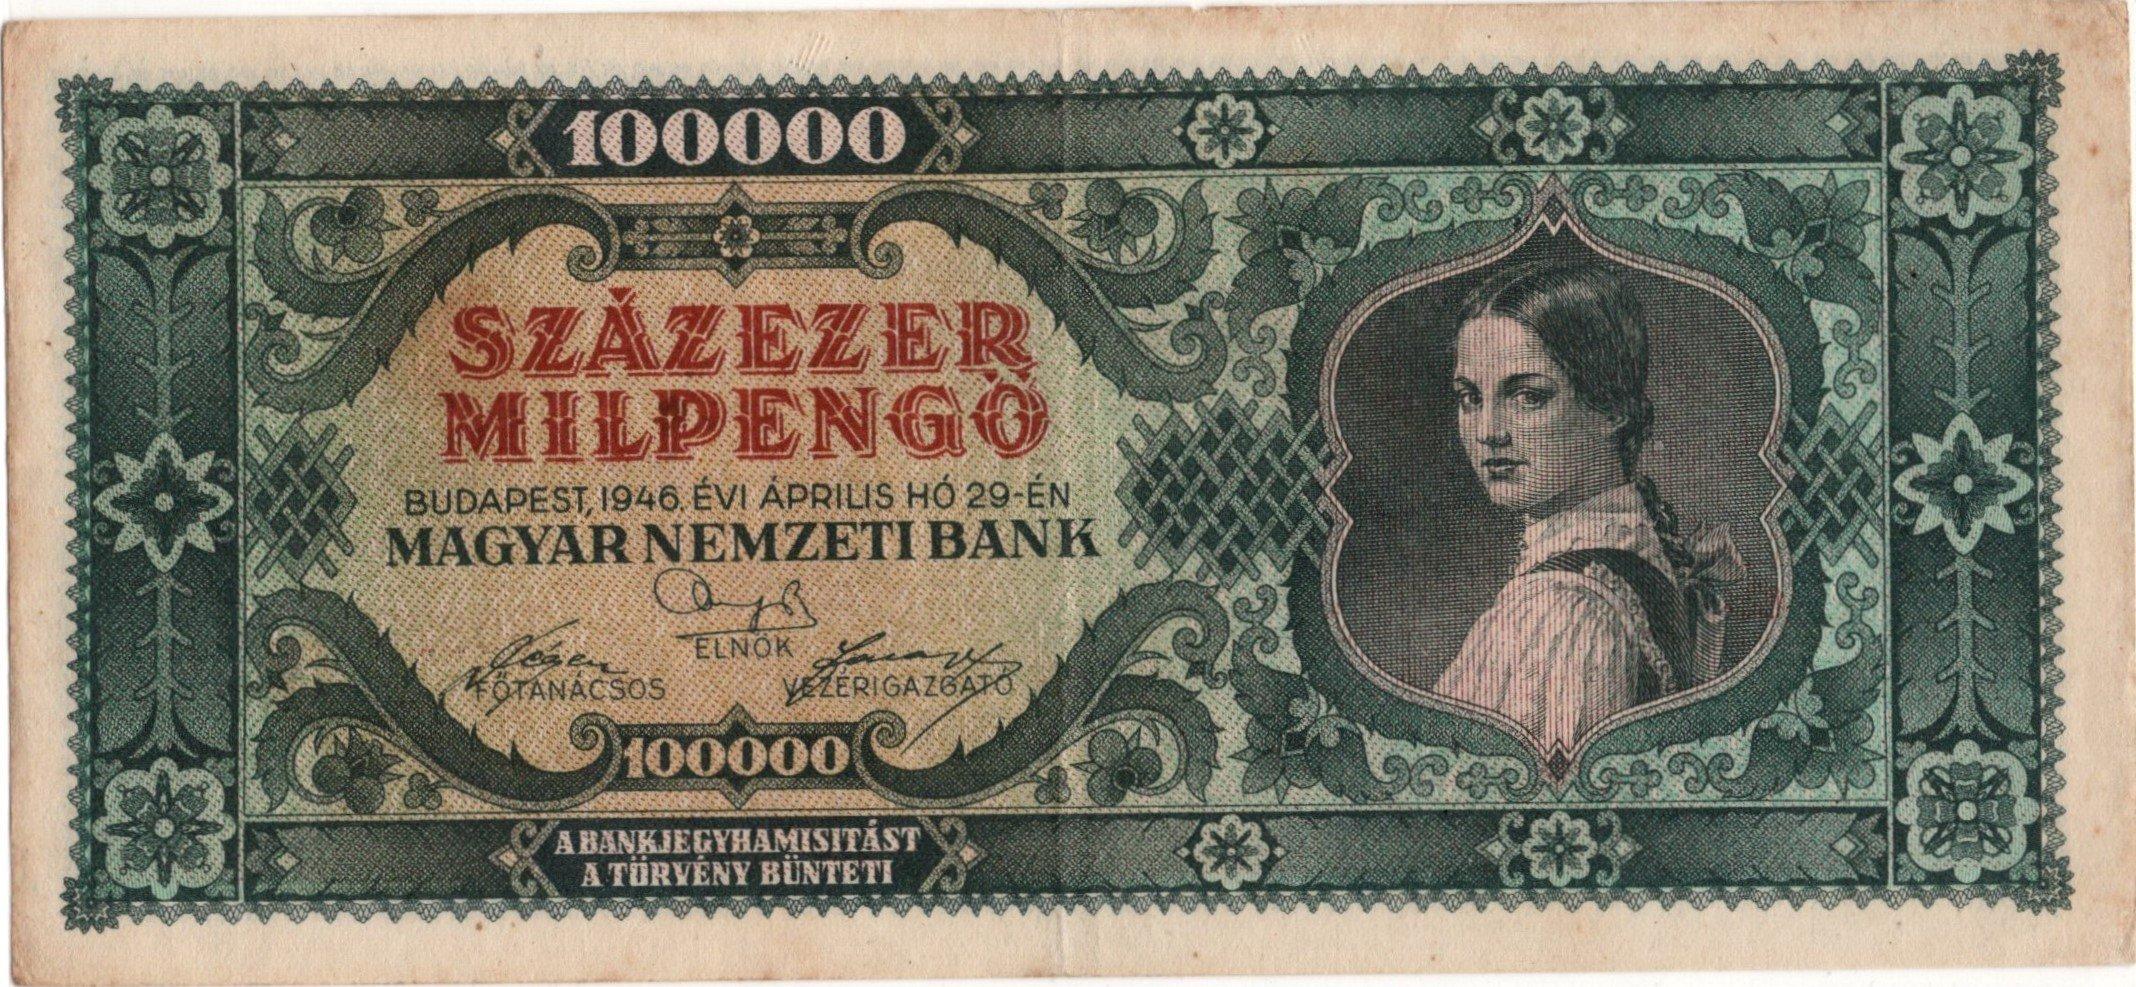 Hungary 100000 pengo 1946